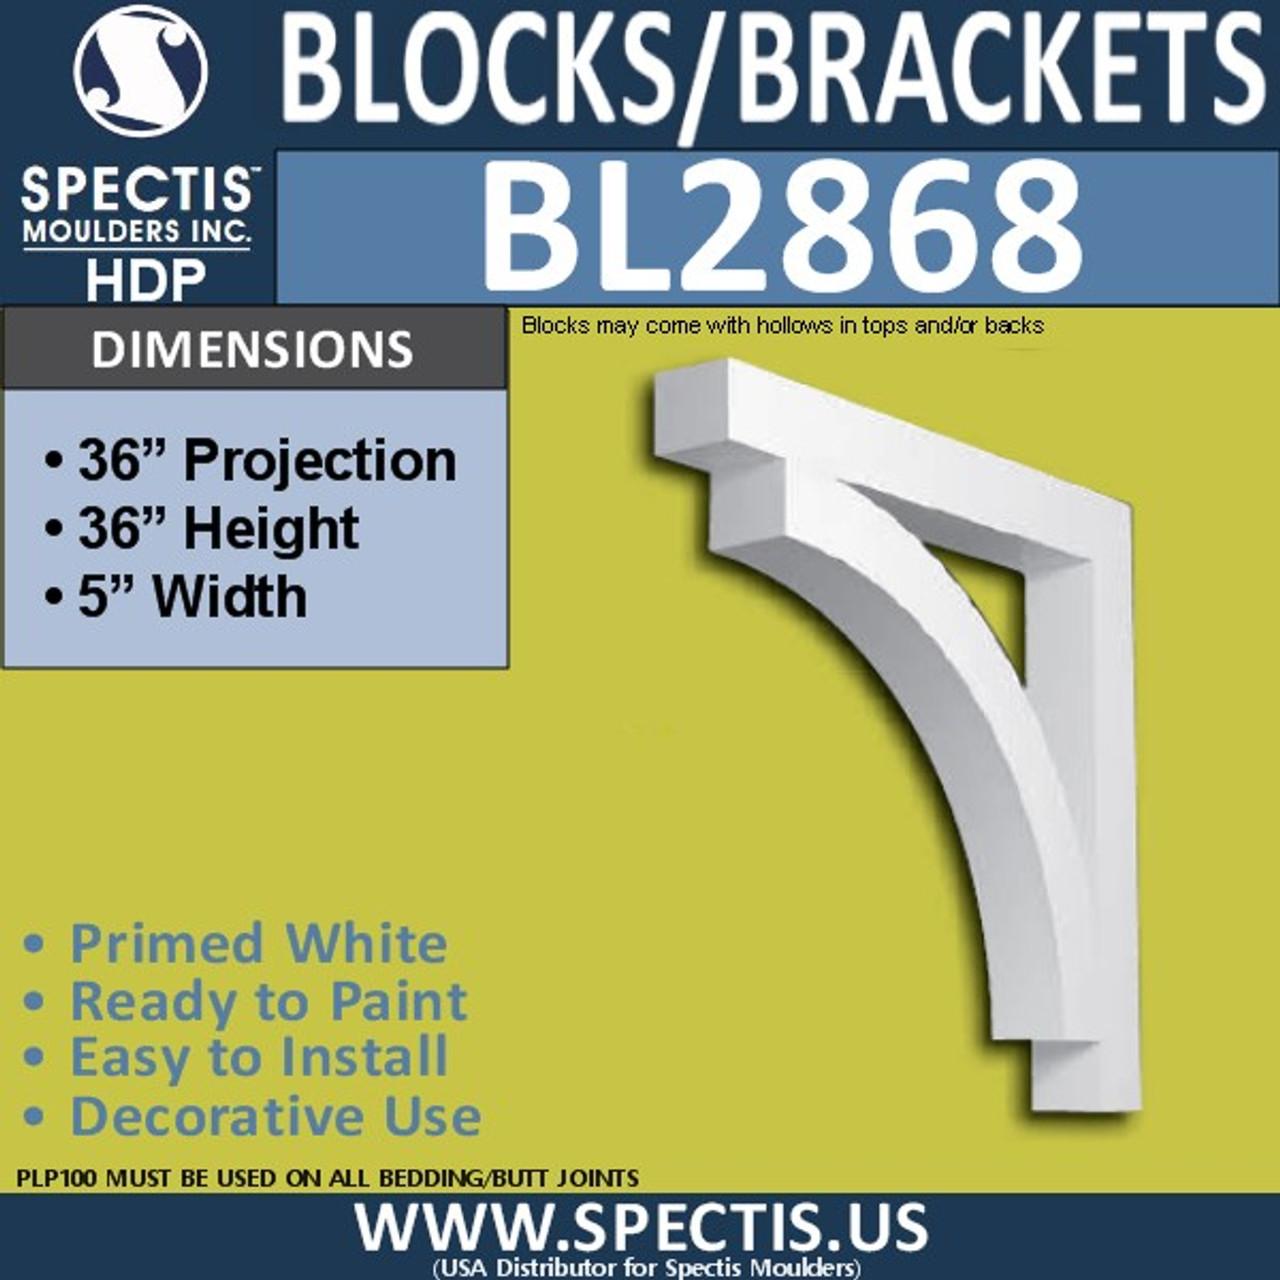 "BL2868 Eave Block or Bracket 5""W x 36""H x 36"" P"